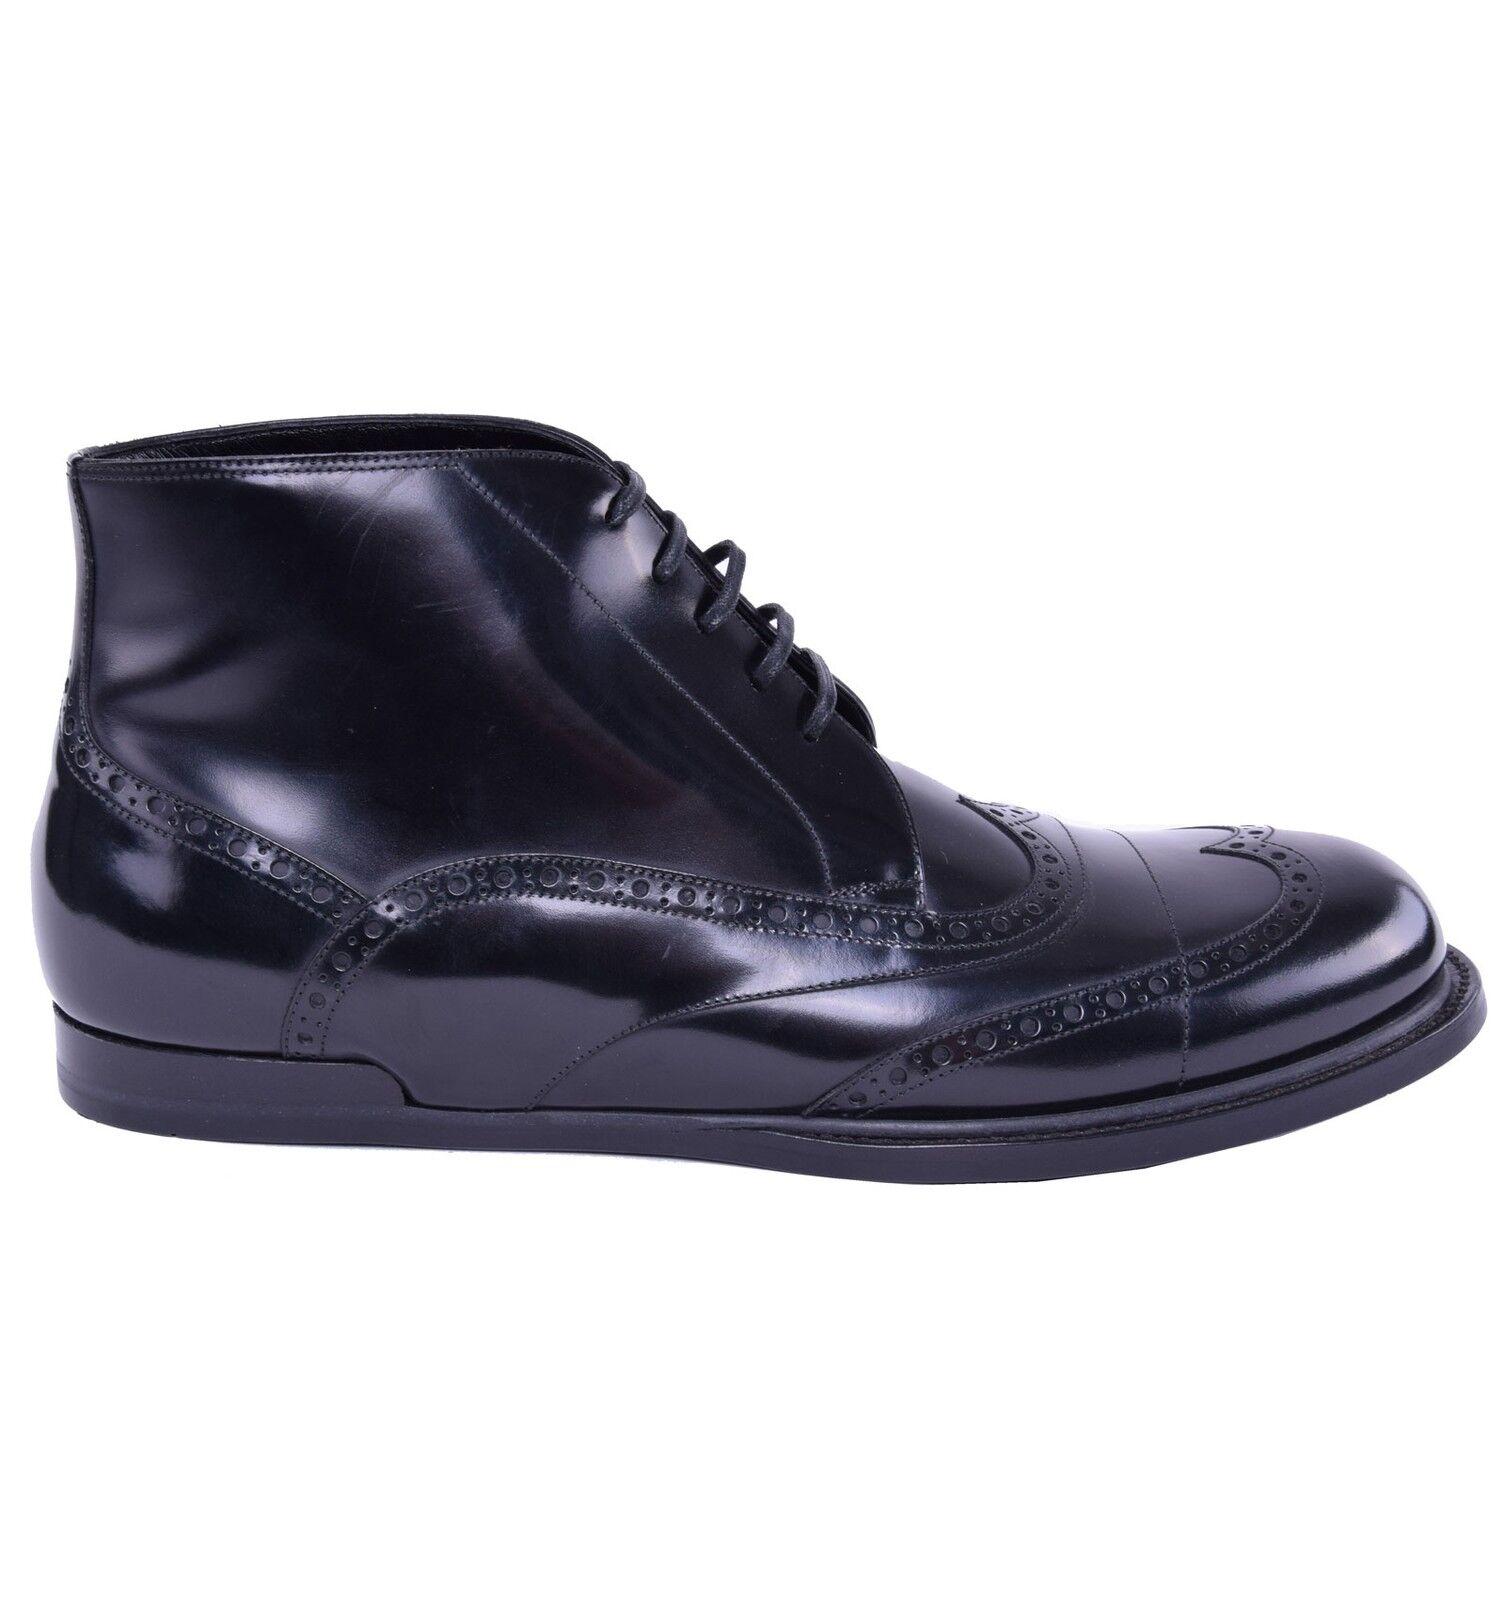 Dolce & gabbana glanzleder business boots black shoes boots 03866